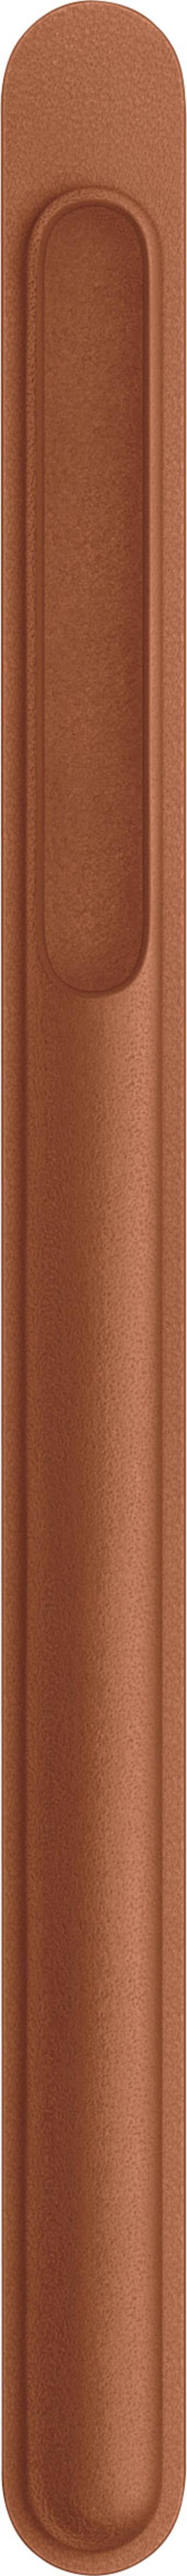 Image of iPad Pro Pencil Case Apple Saddle brown